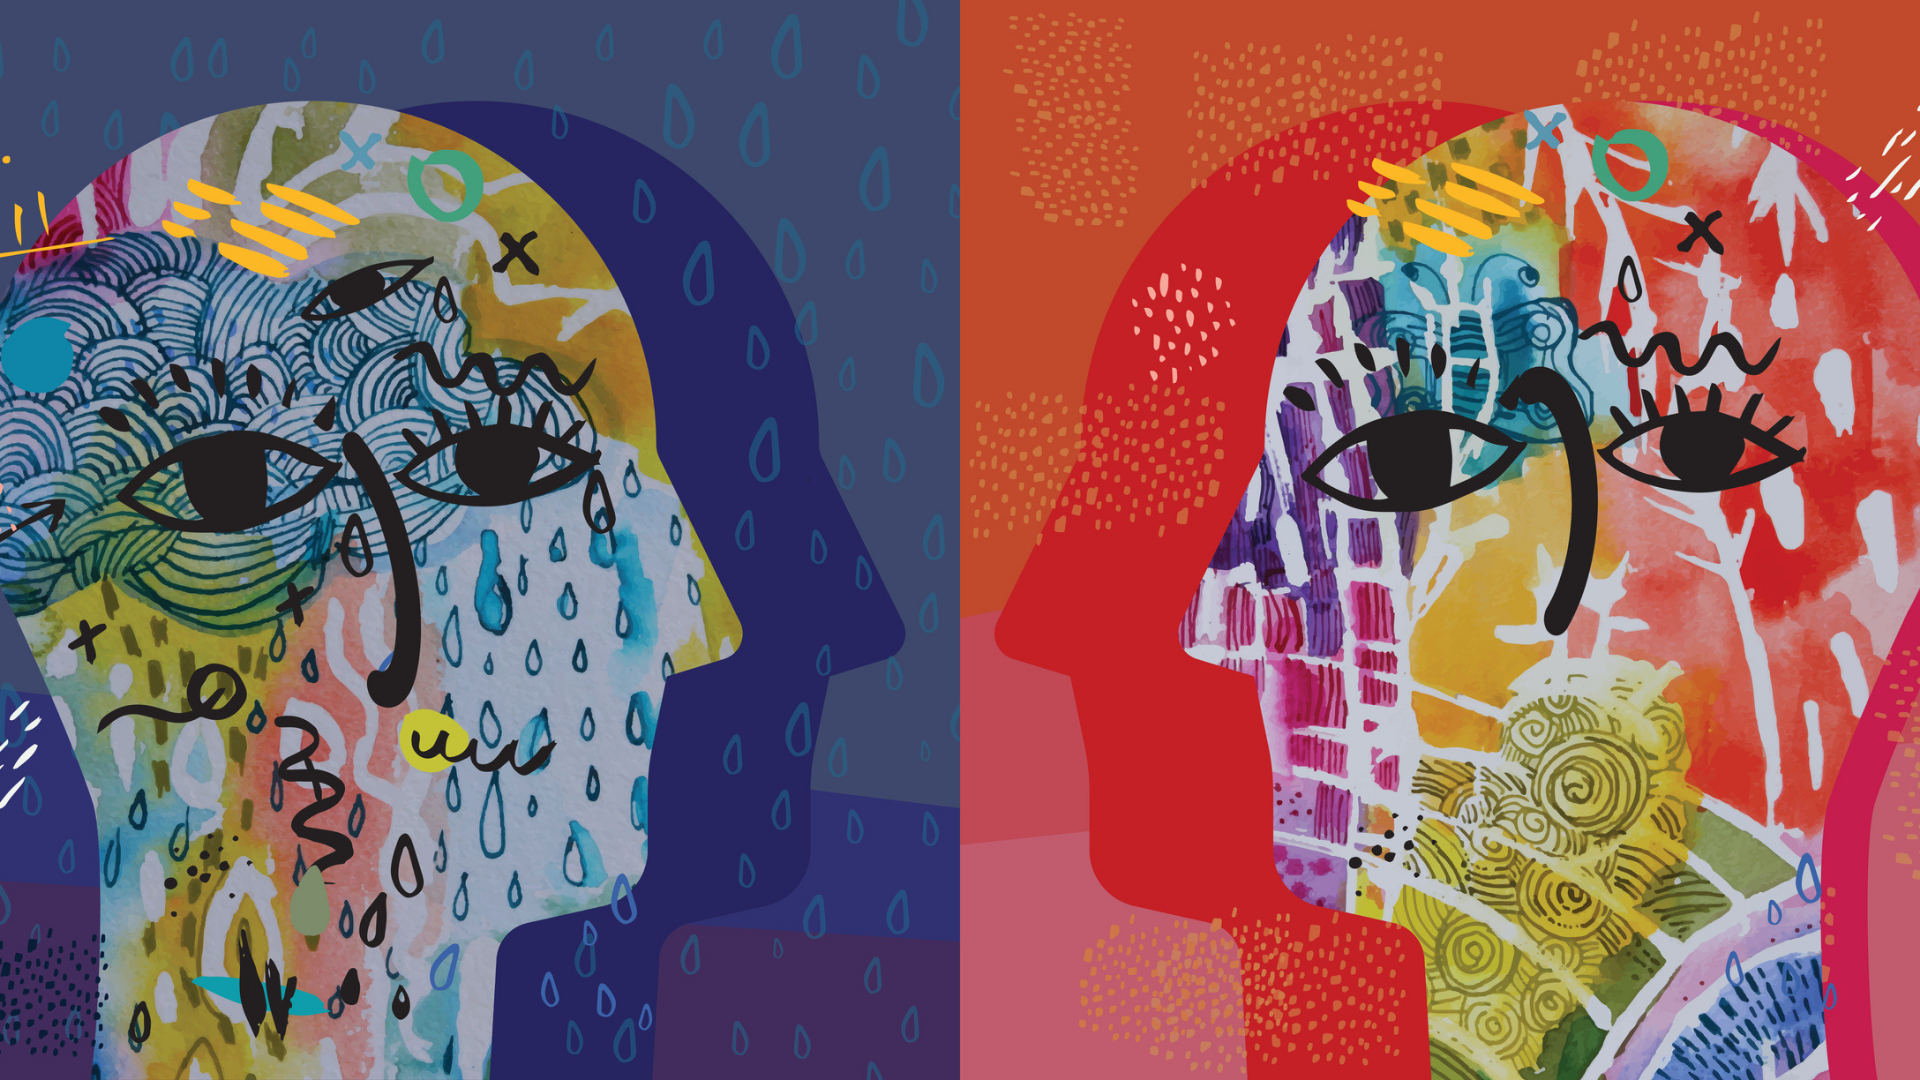 Explaining Neurochemistry & Emotions: An Interview with Lisa Feldman Barrett, Ph.D.